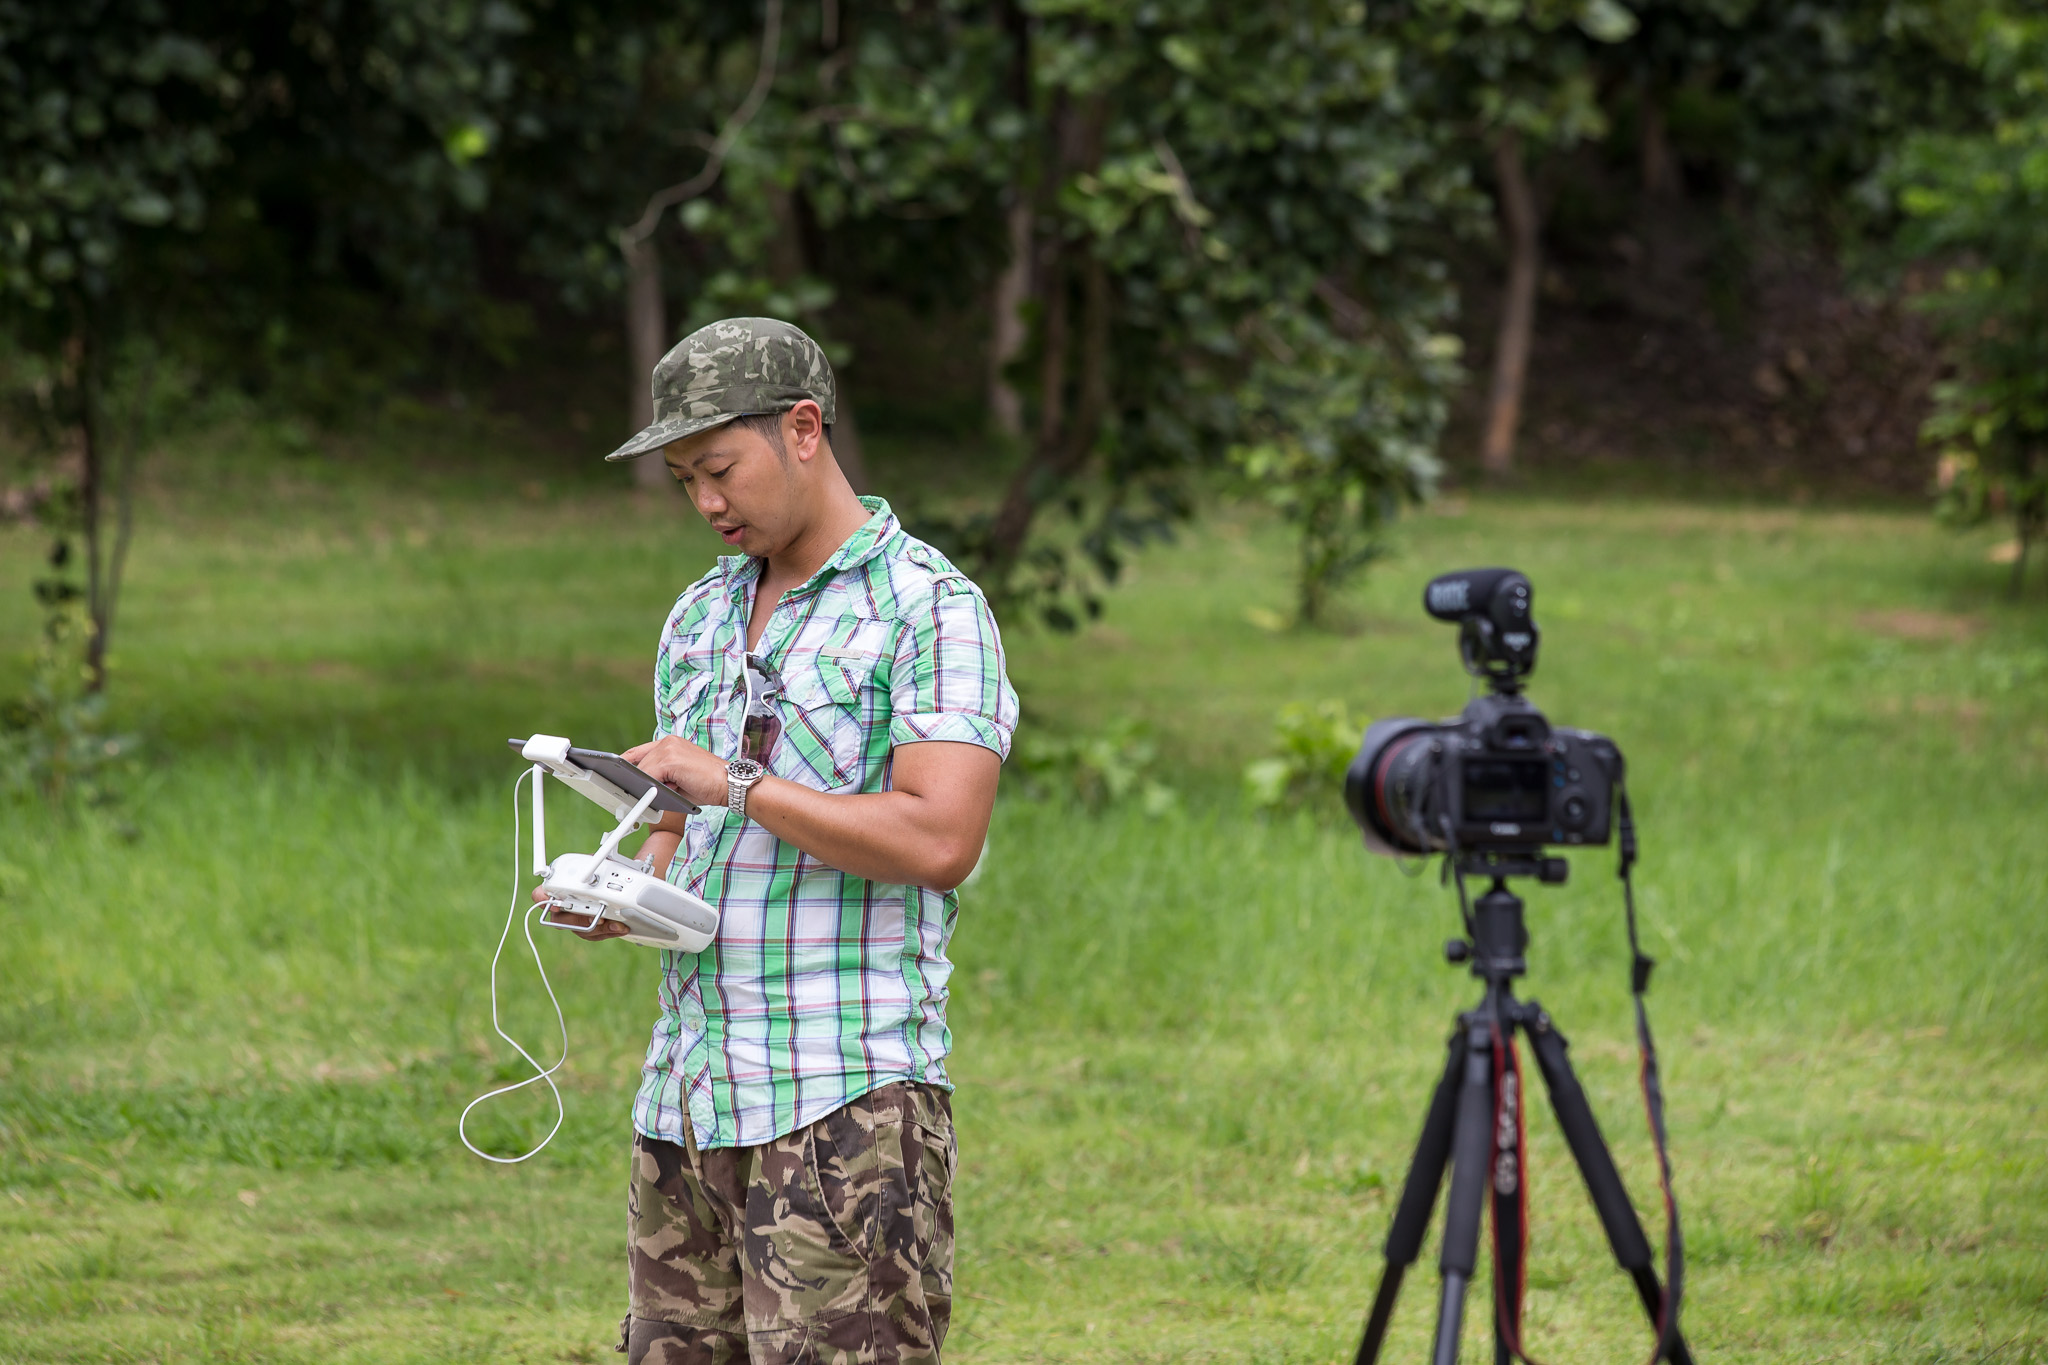 Vancouver videographer